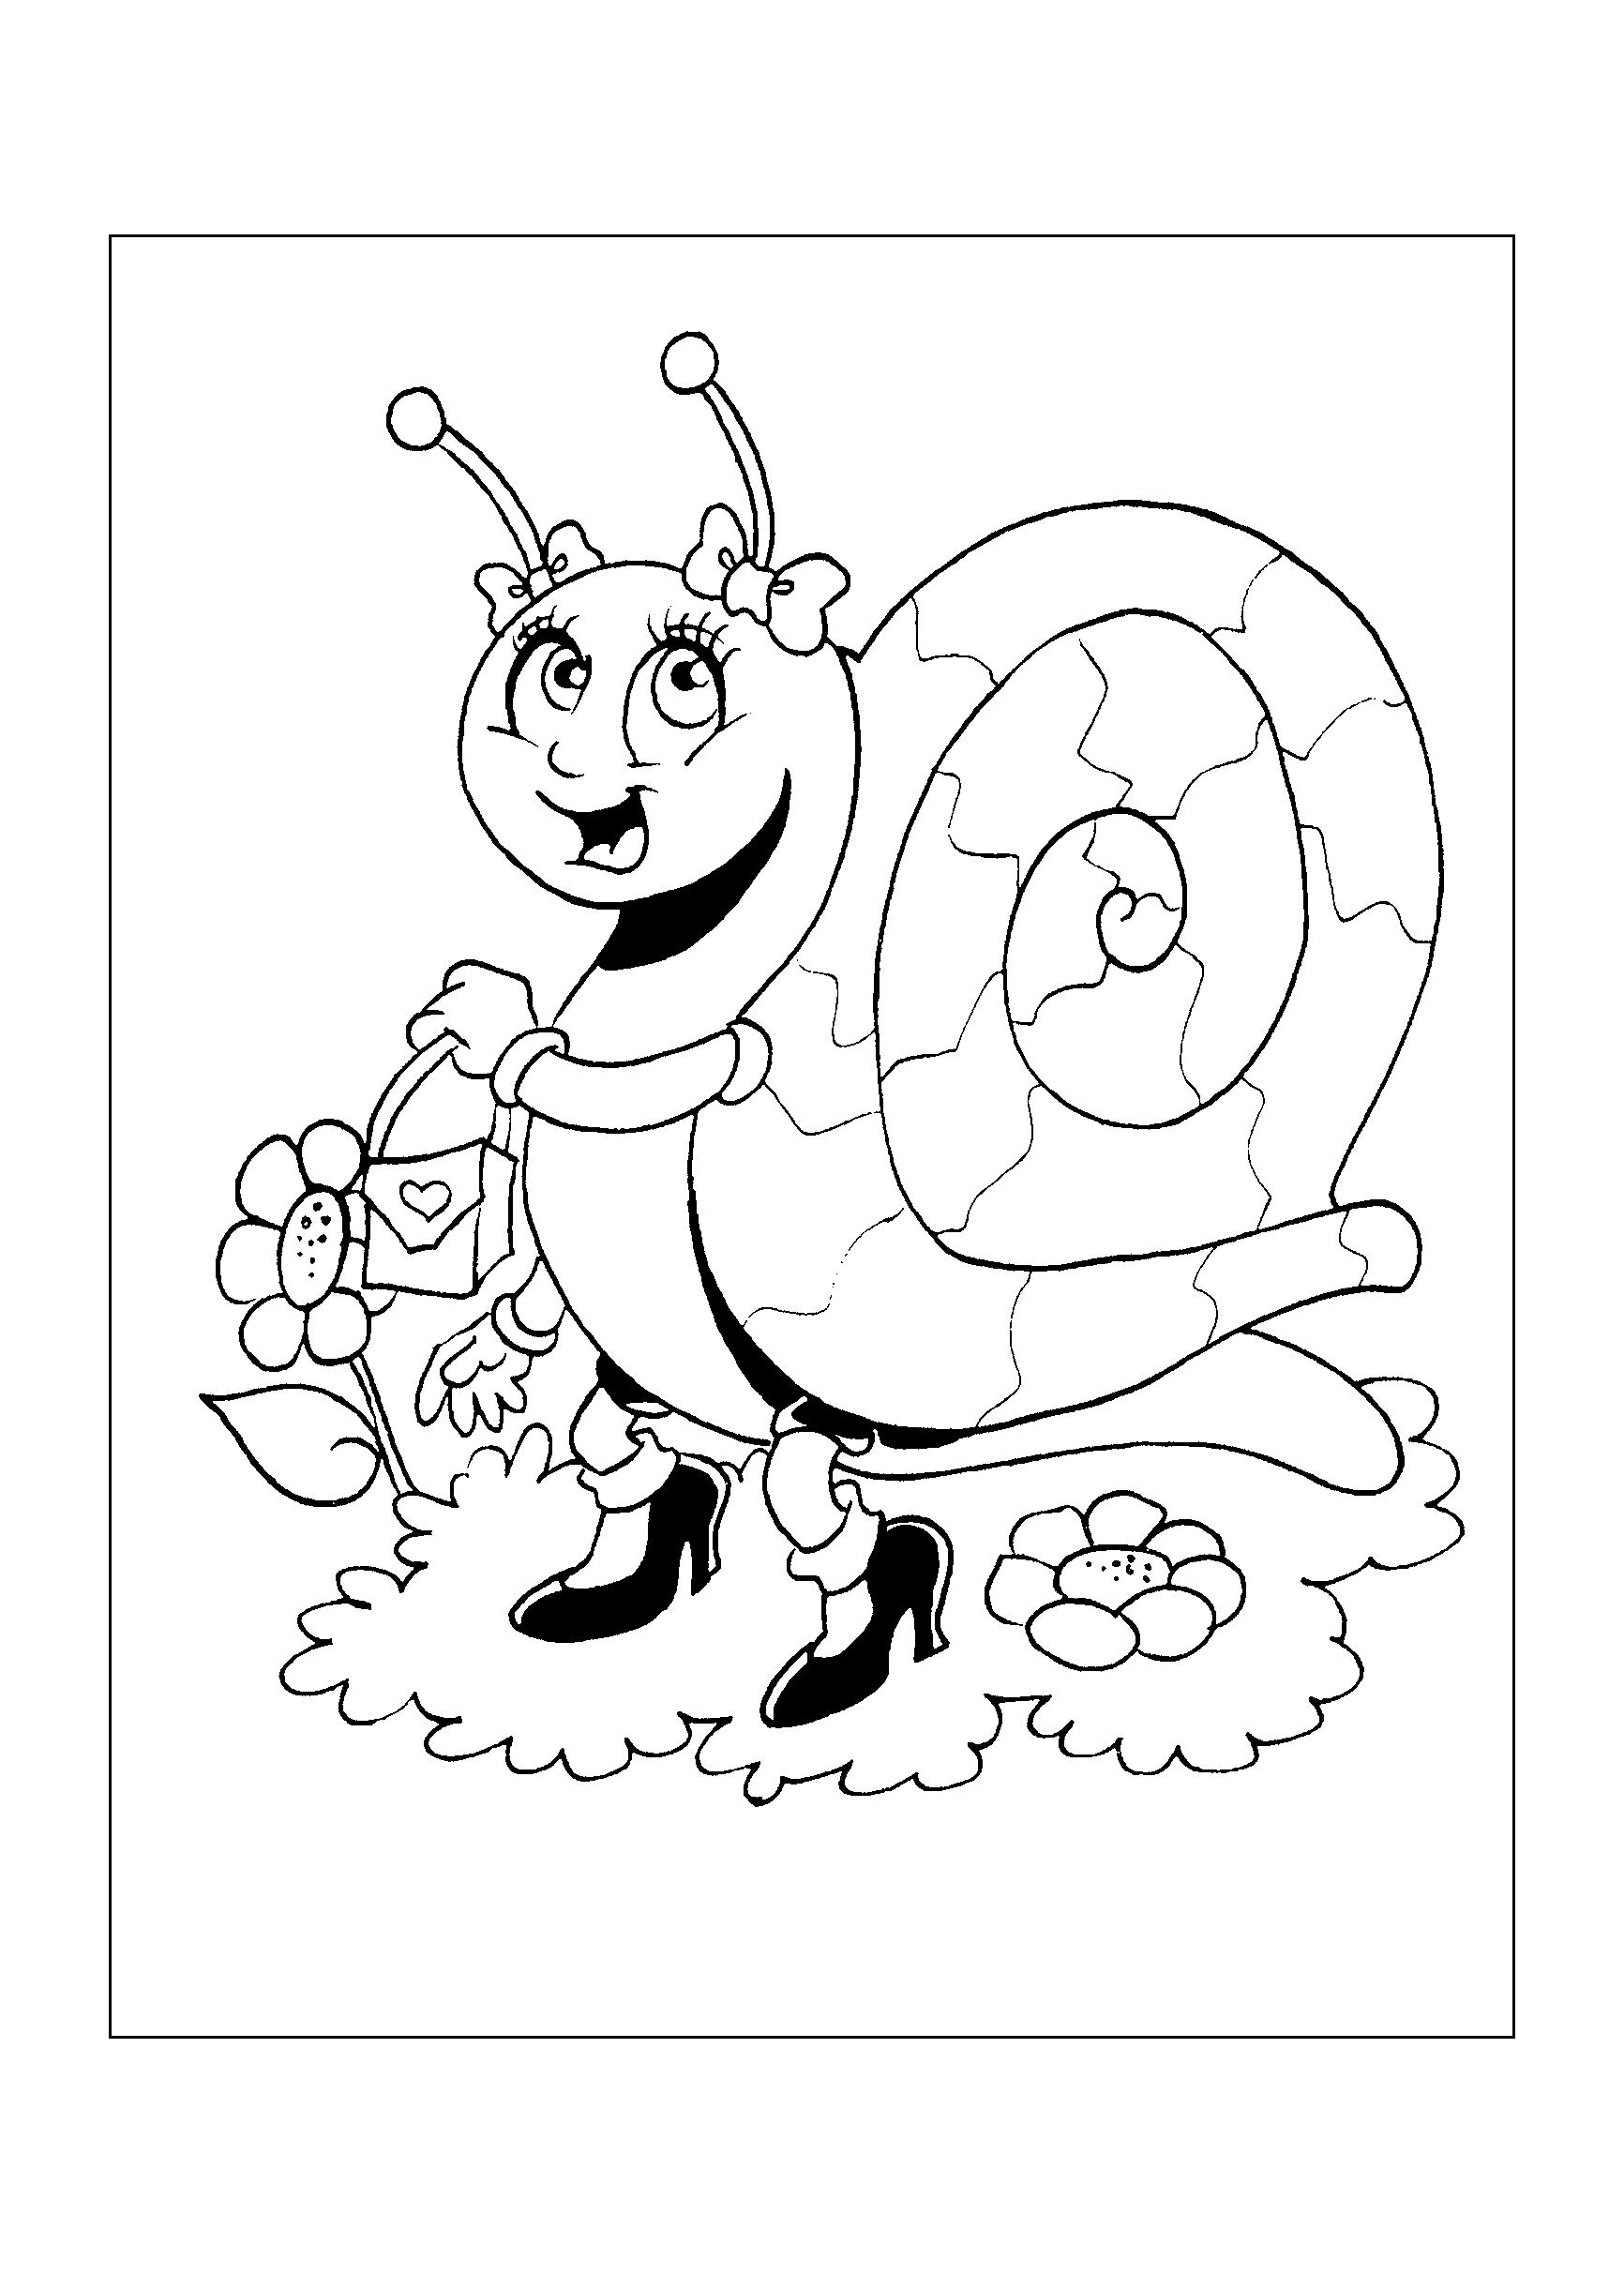 0160-desenho-colorir-caracol